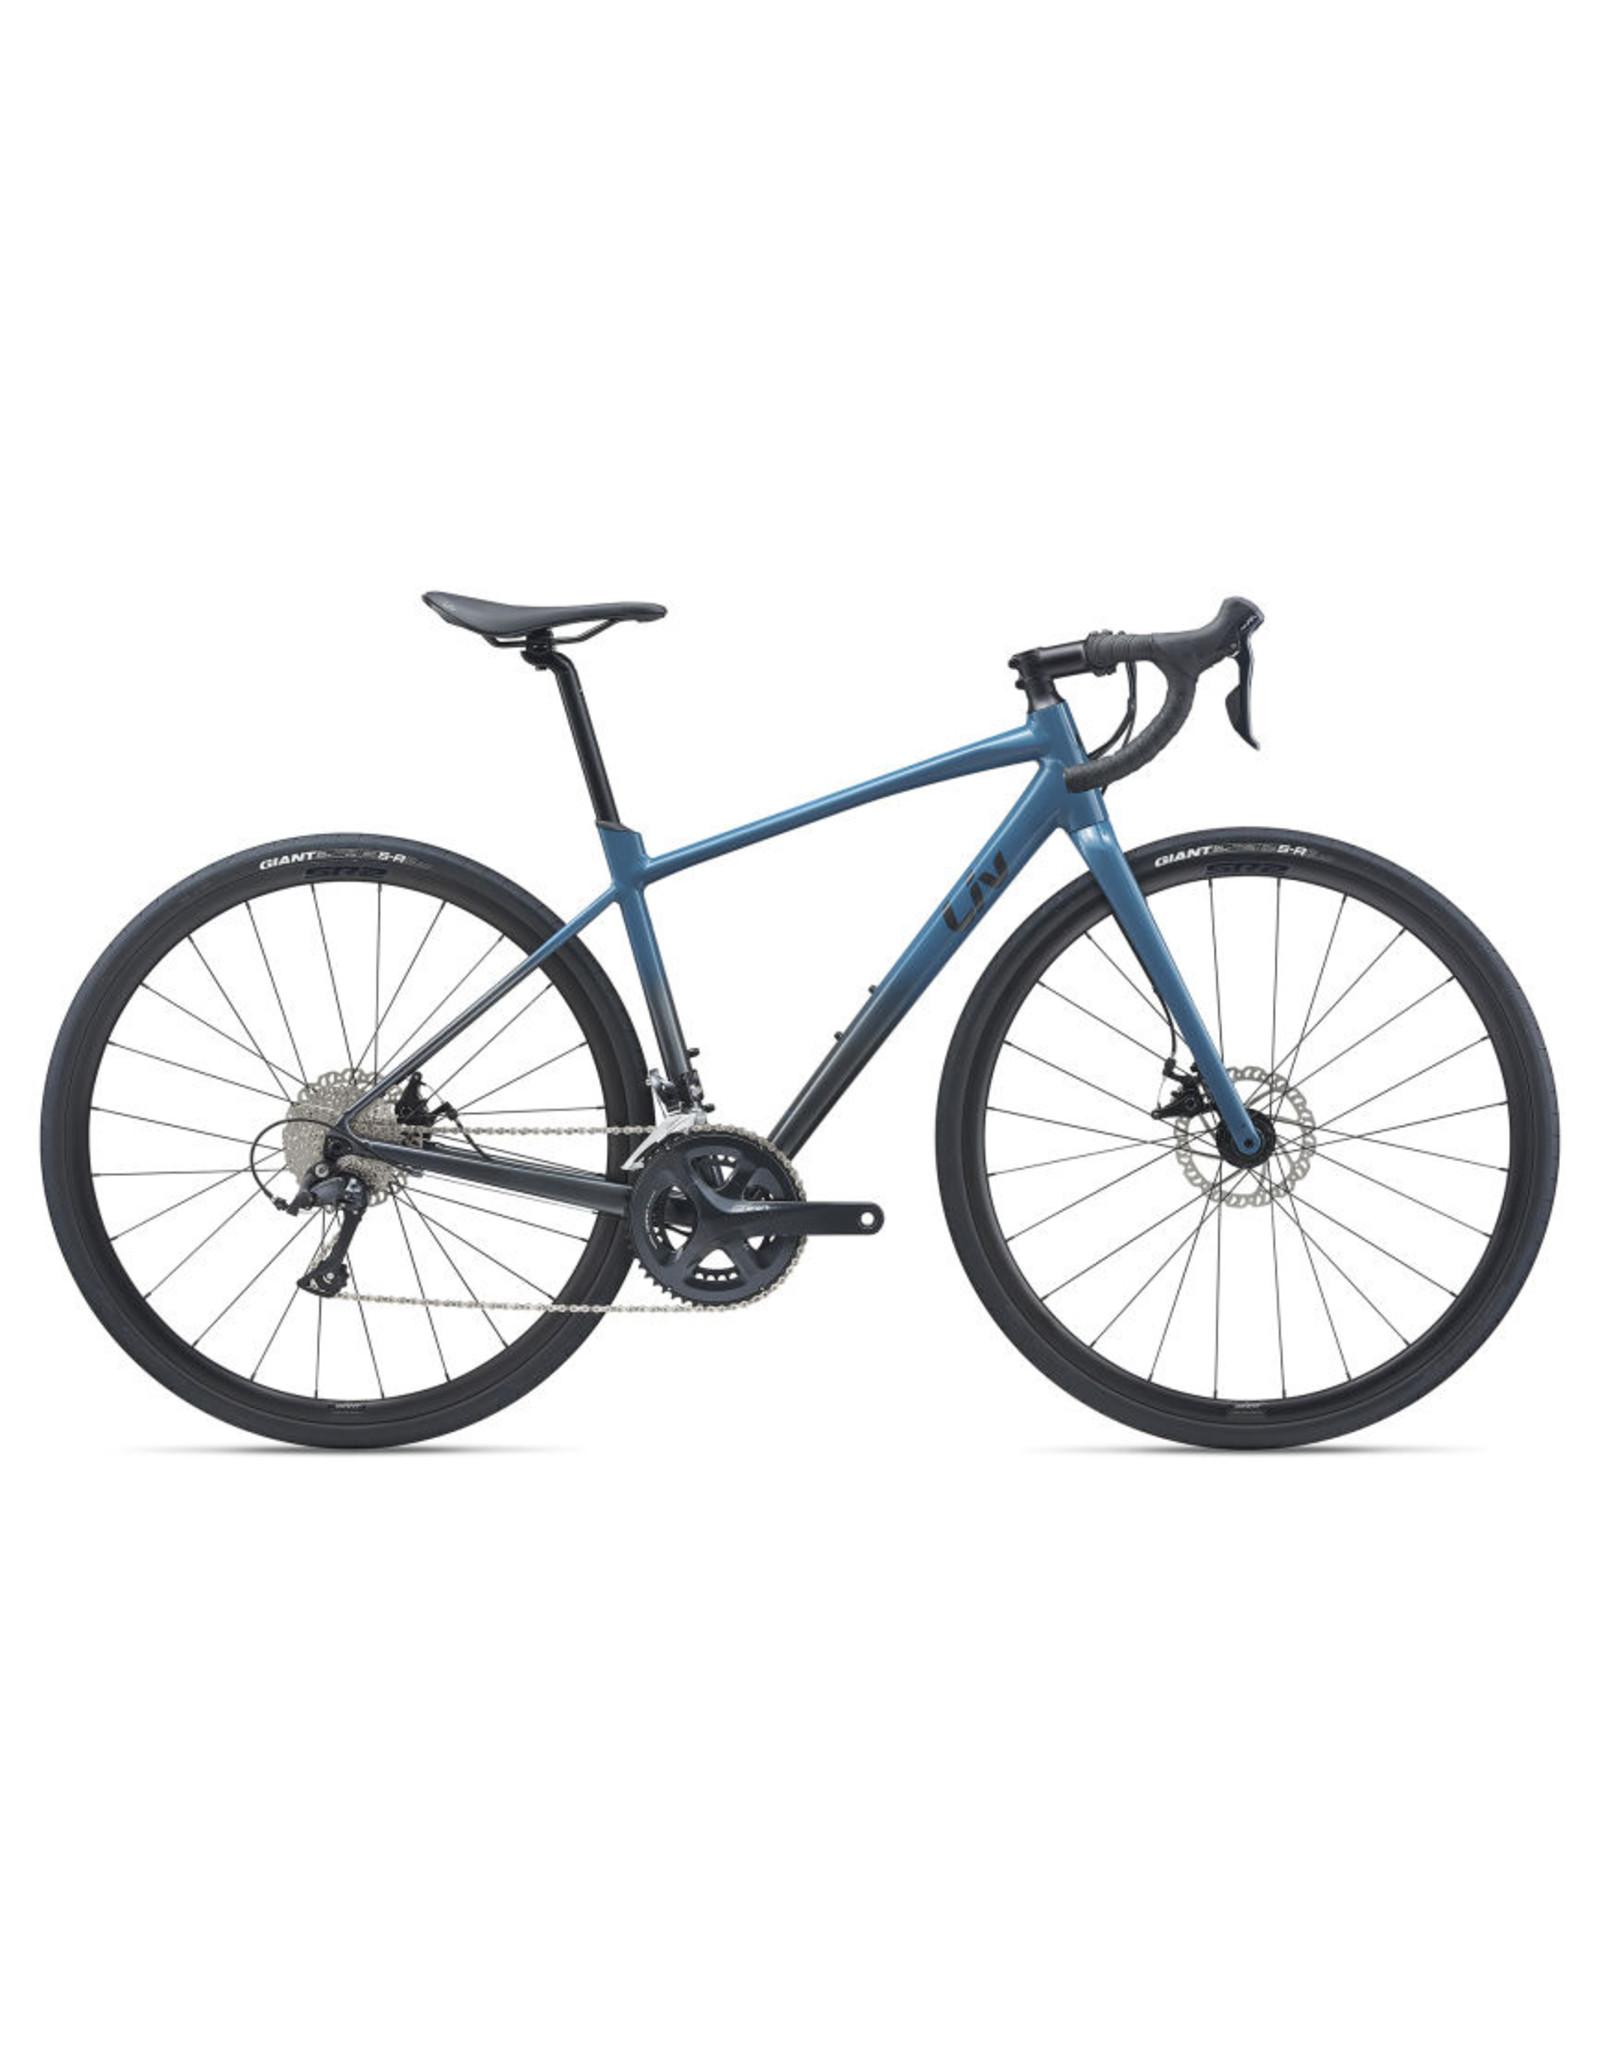 Liv Avail AR 3 S Grayish Blue